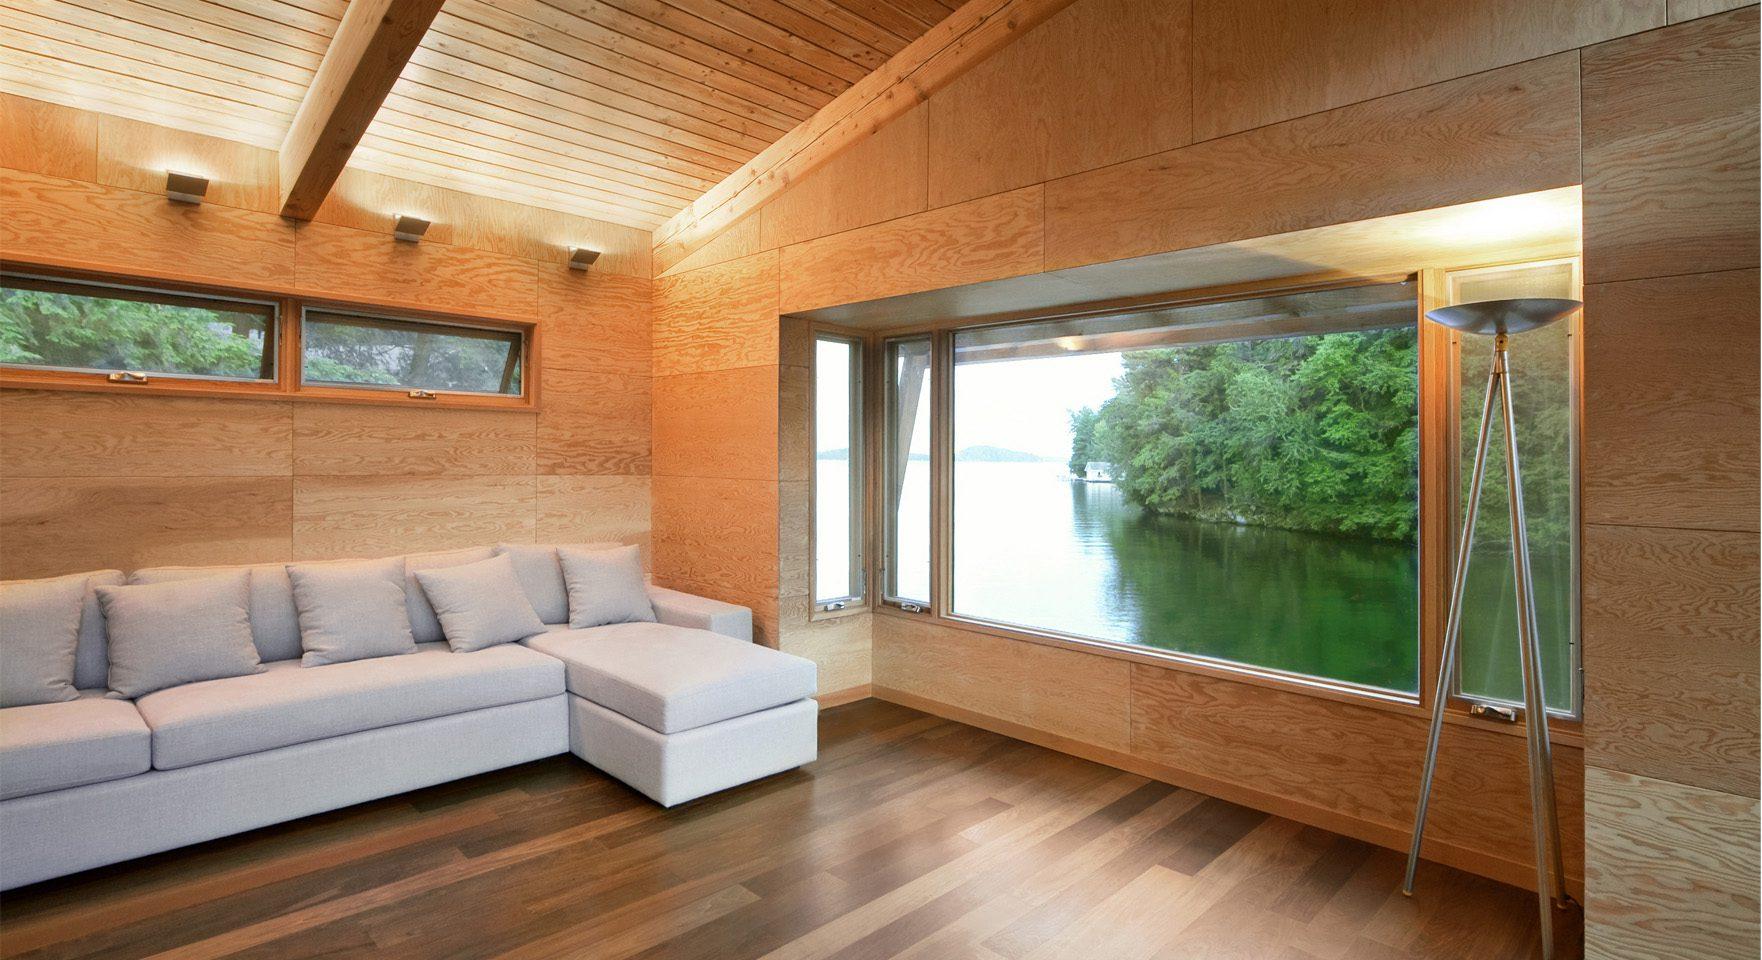 Boathouse-in-Muskoka-Lakes-03